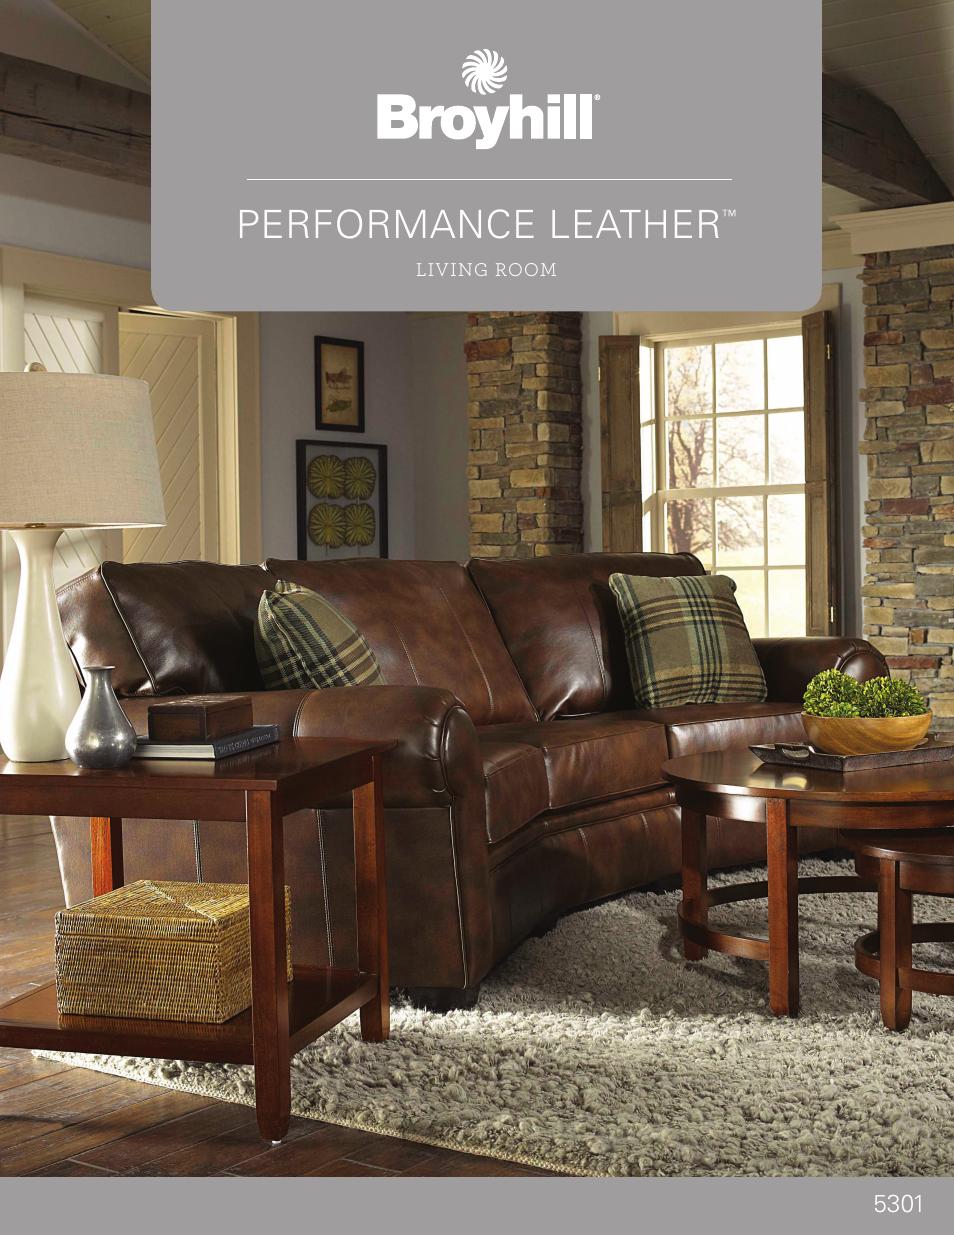 broyhill larkin conversation sofa chairs ottoman product details rh manualsdir com